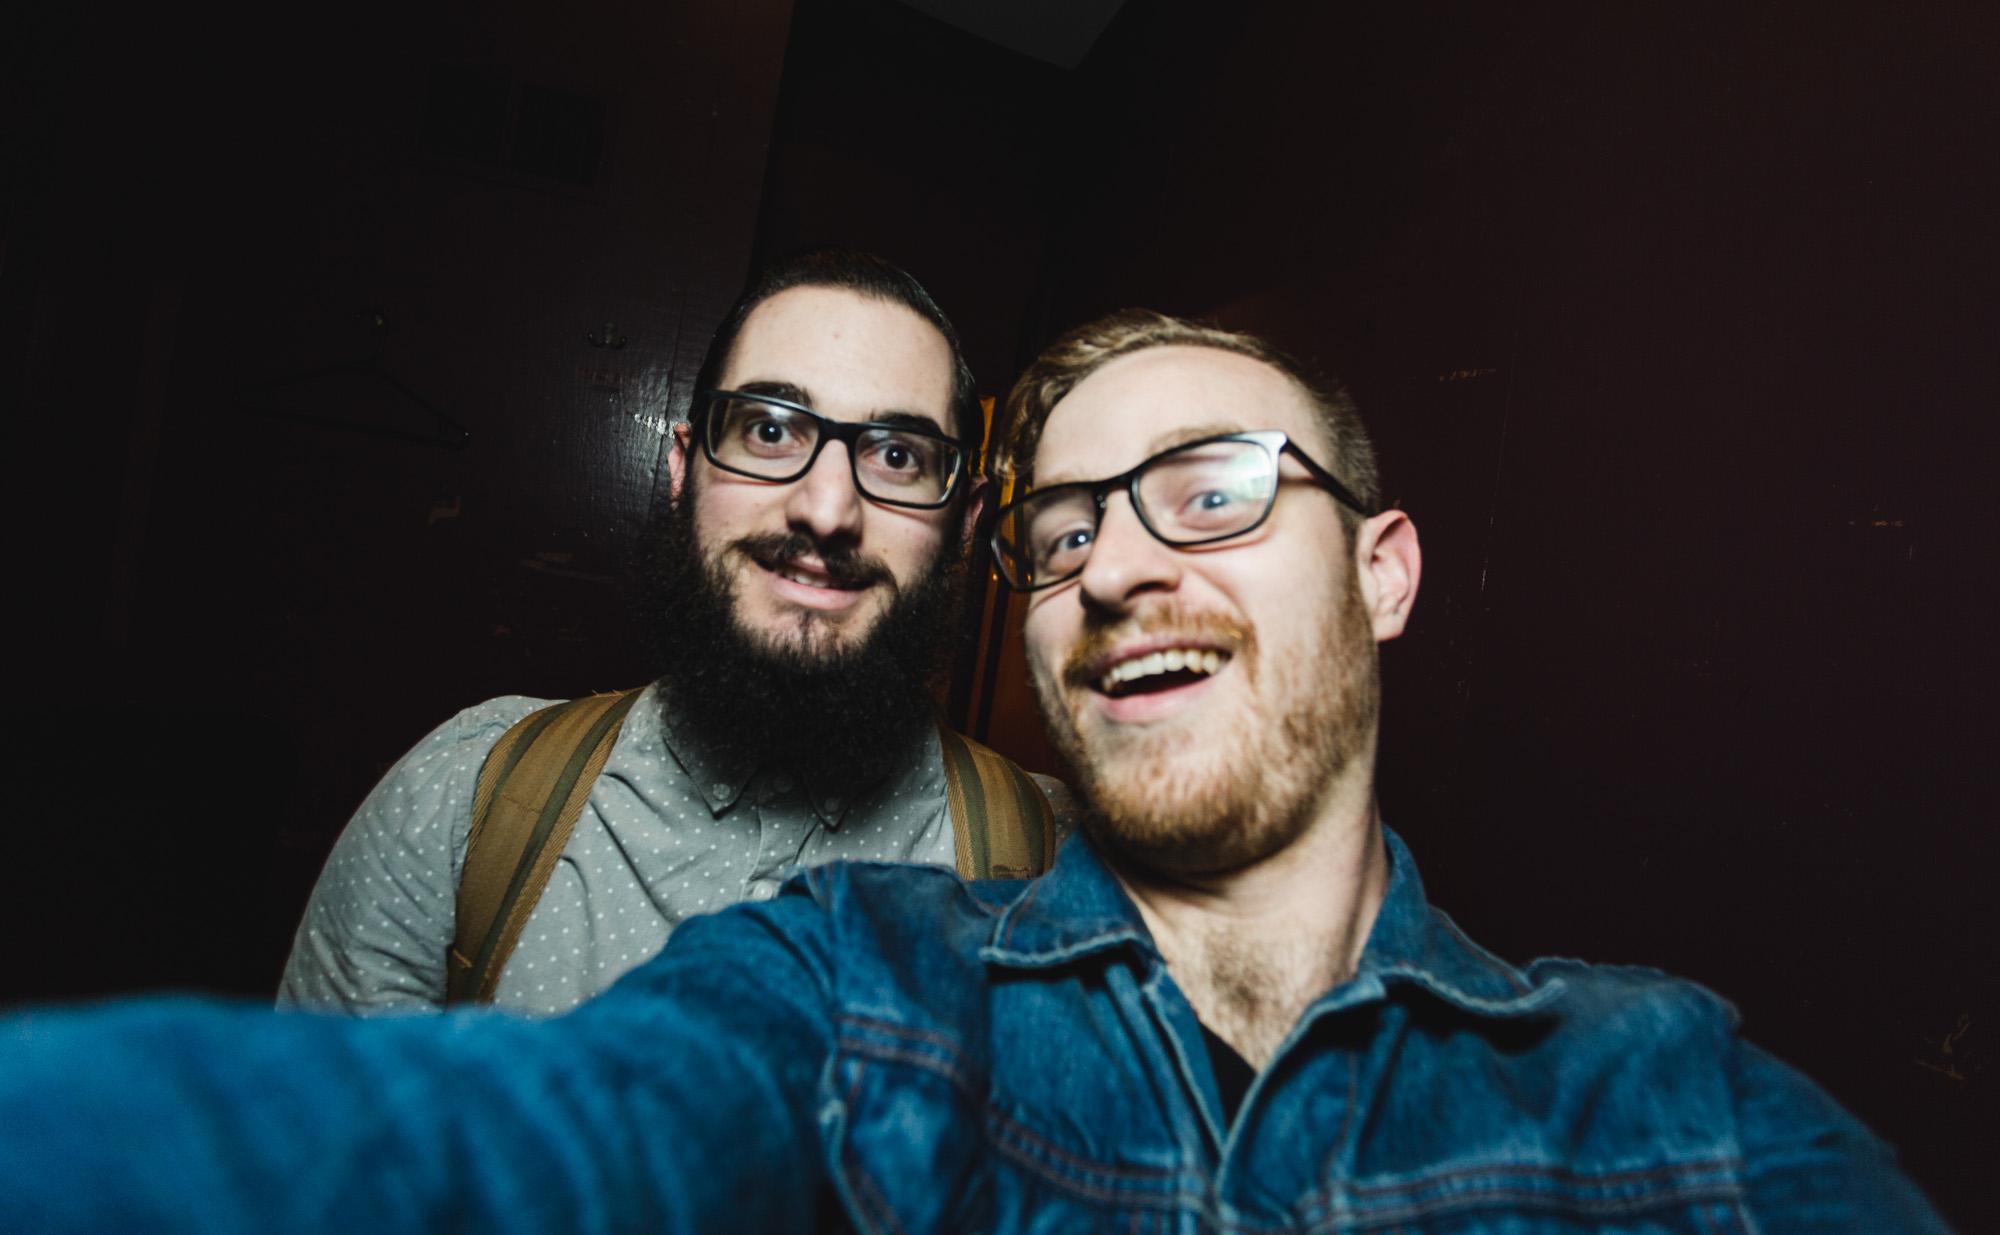 Quinn Selfie